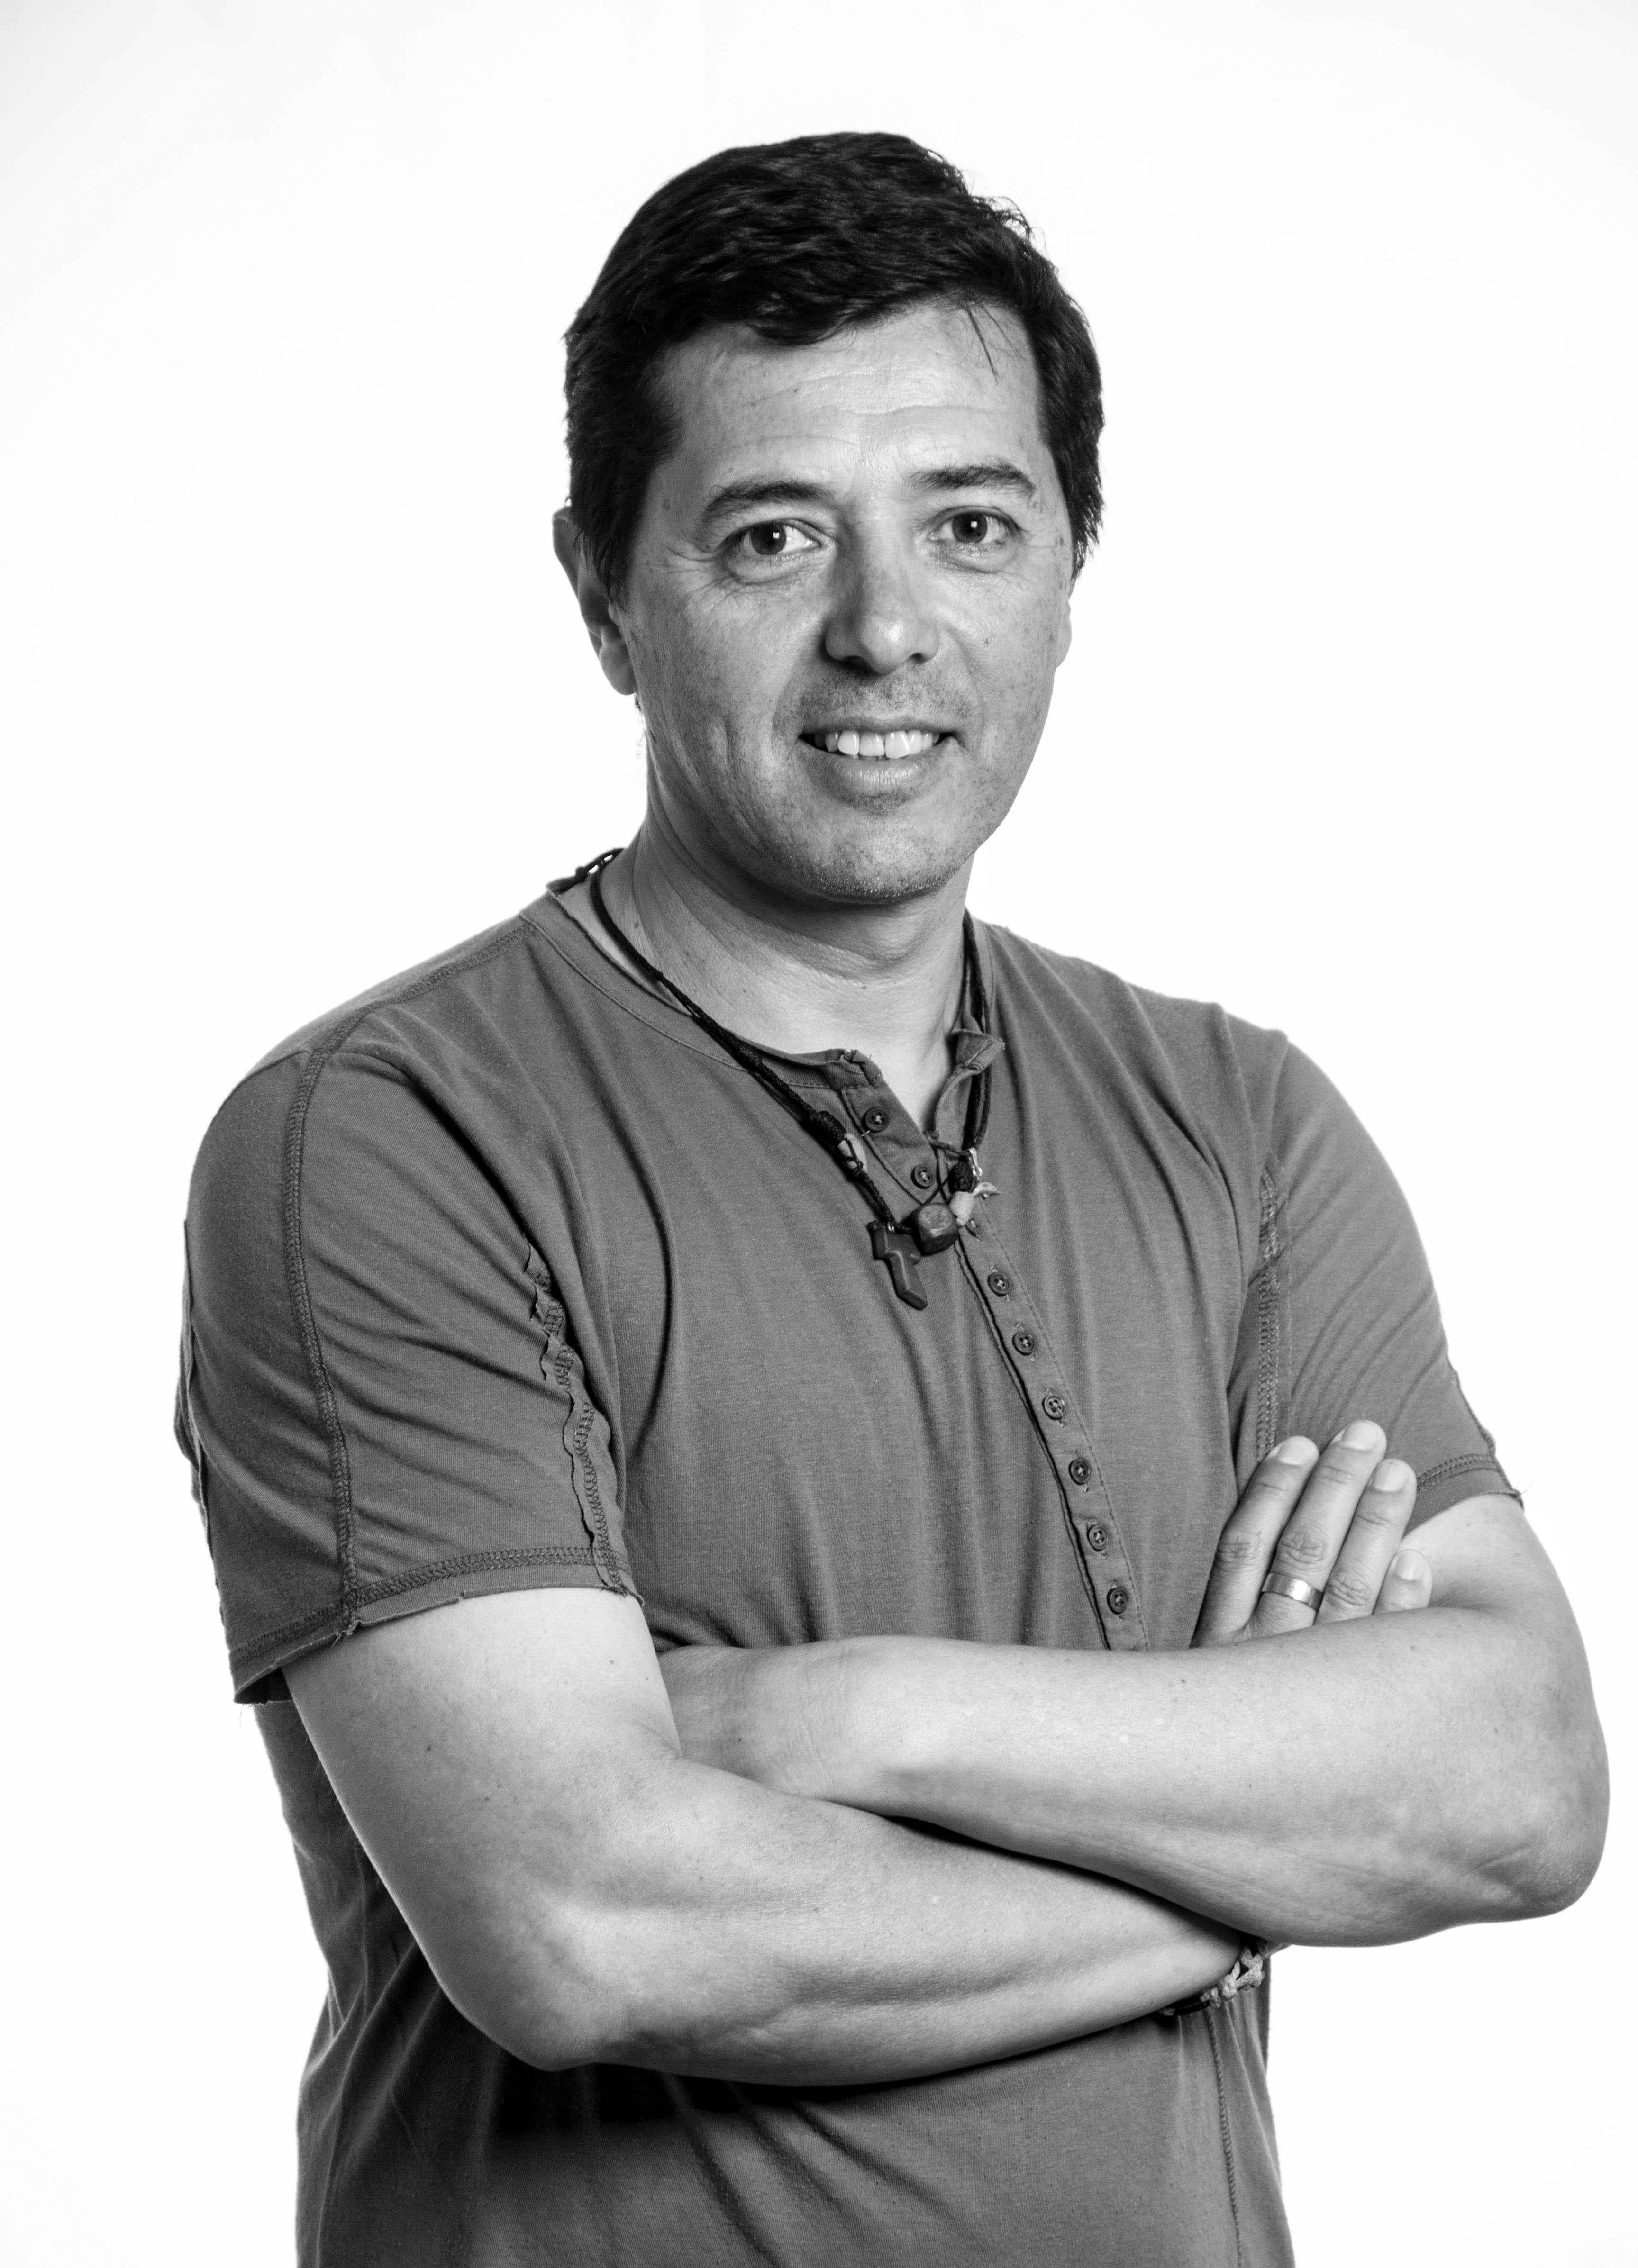 Guillermo Silpituca